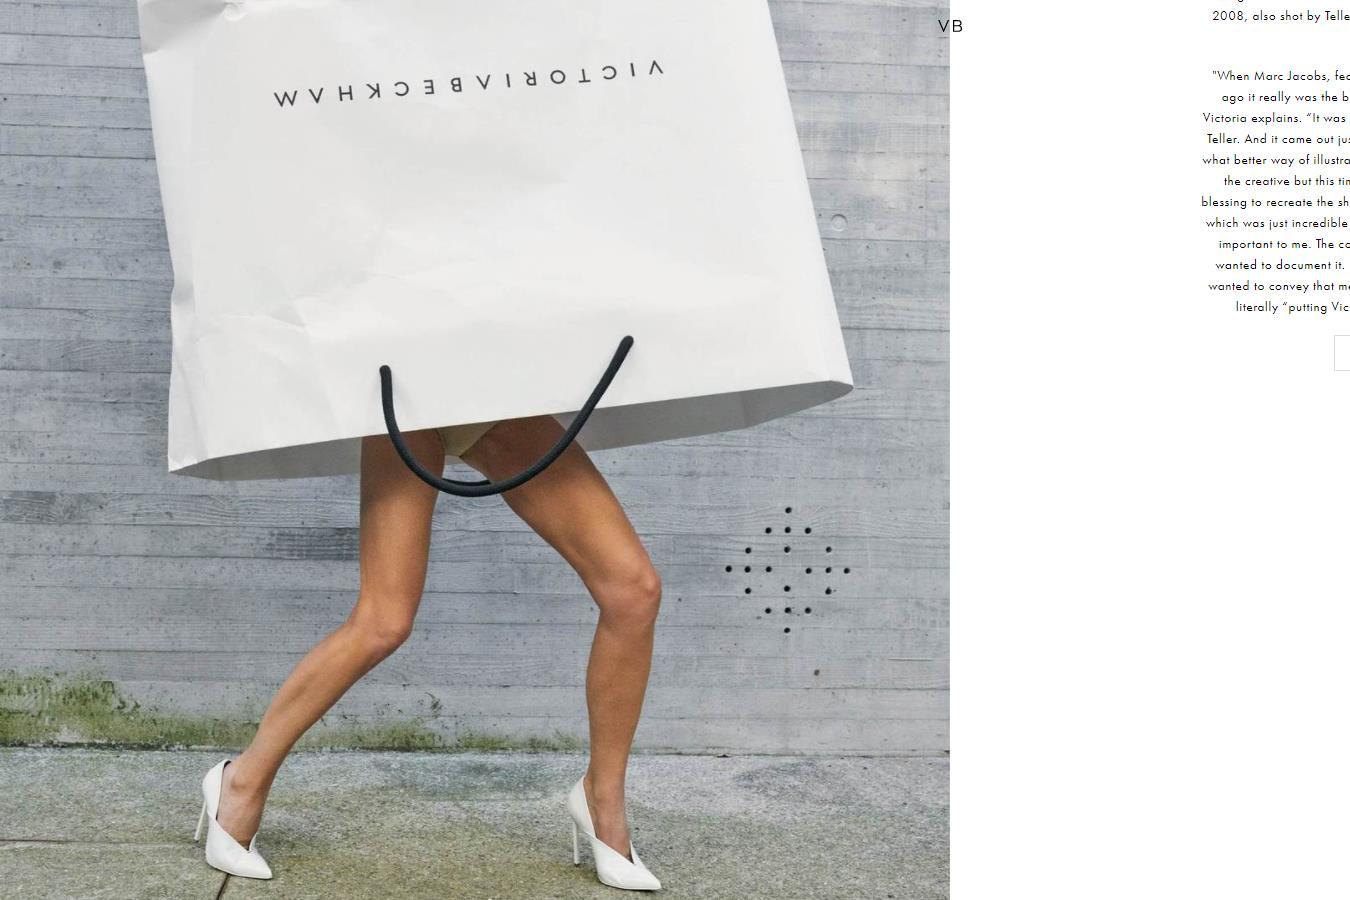 Victoria Beckham 品牌首次推出广告大片,贝嫂亲自上阵演绎,把自己装进了购物袋 !